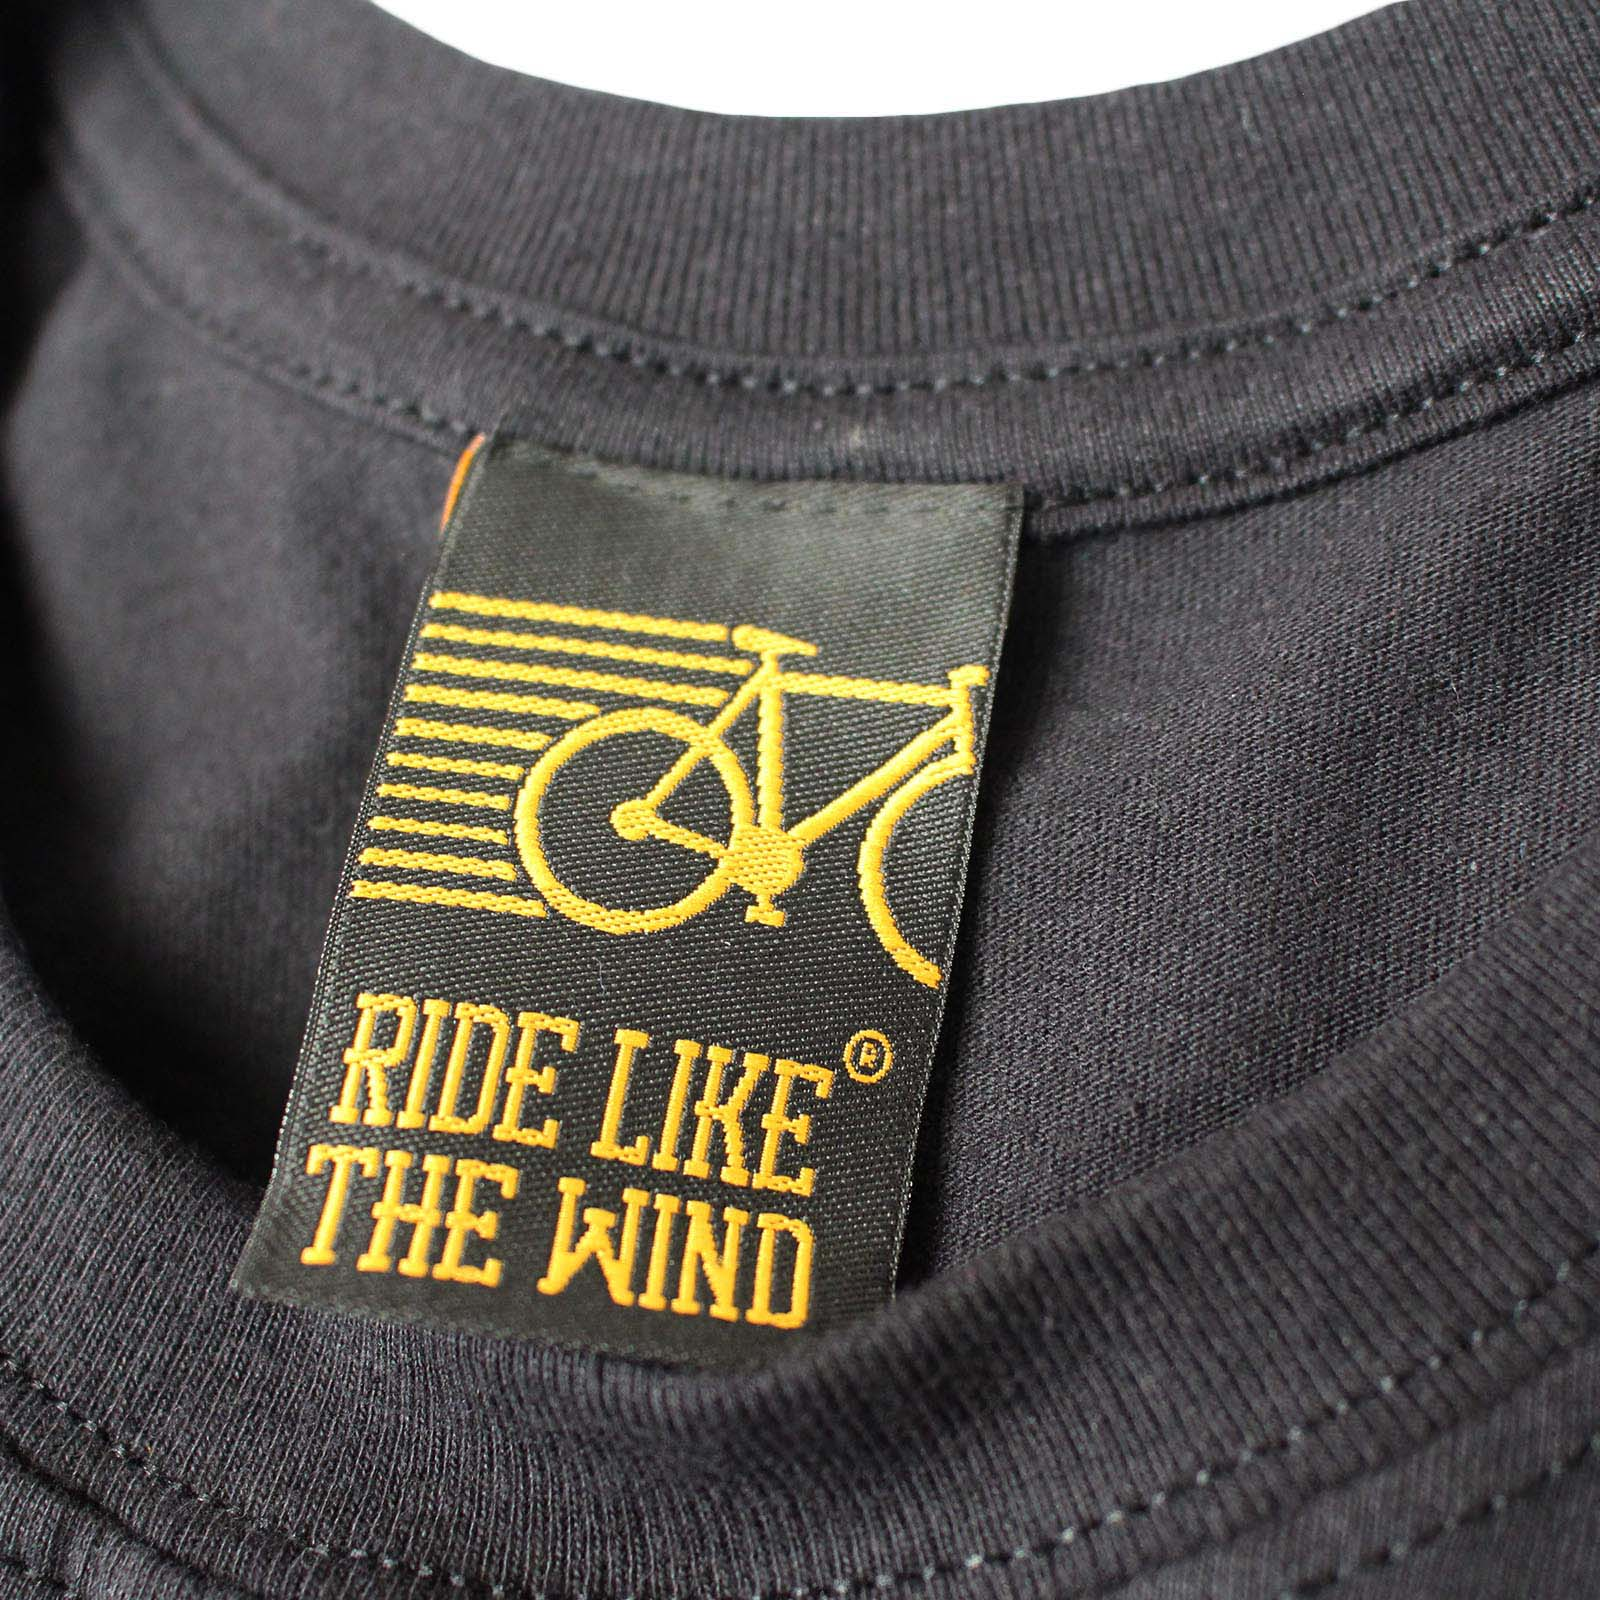 Cycling-Yeah-My-Bike-Did-Cost-More-funny-top-Birthday-tee-T-SHIRT-T-SHIRT thumbnail 4